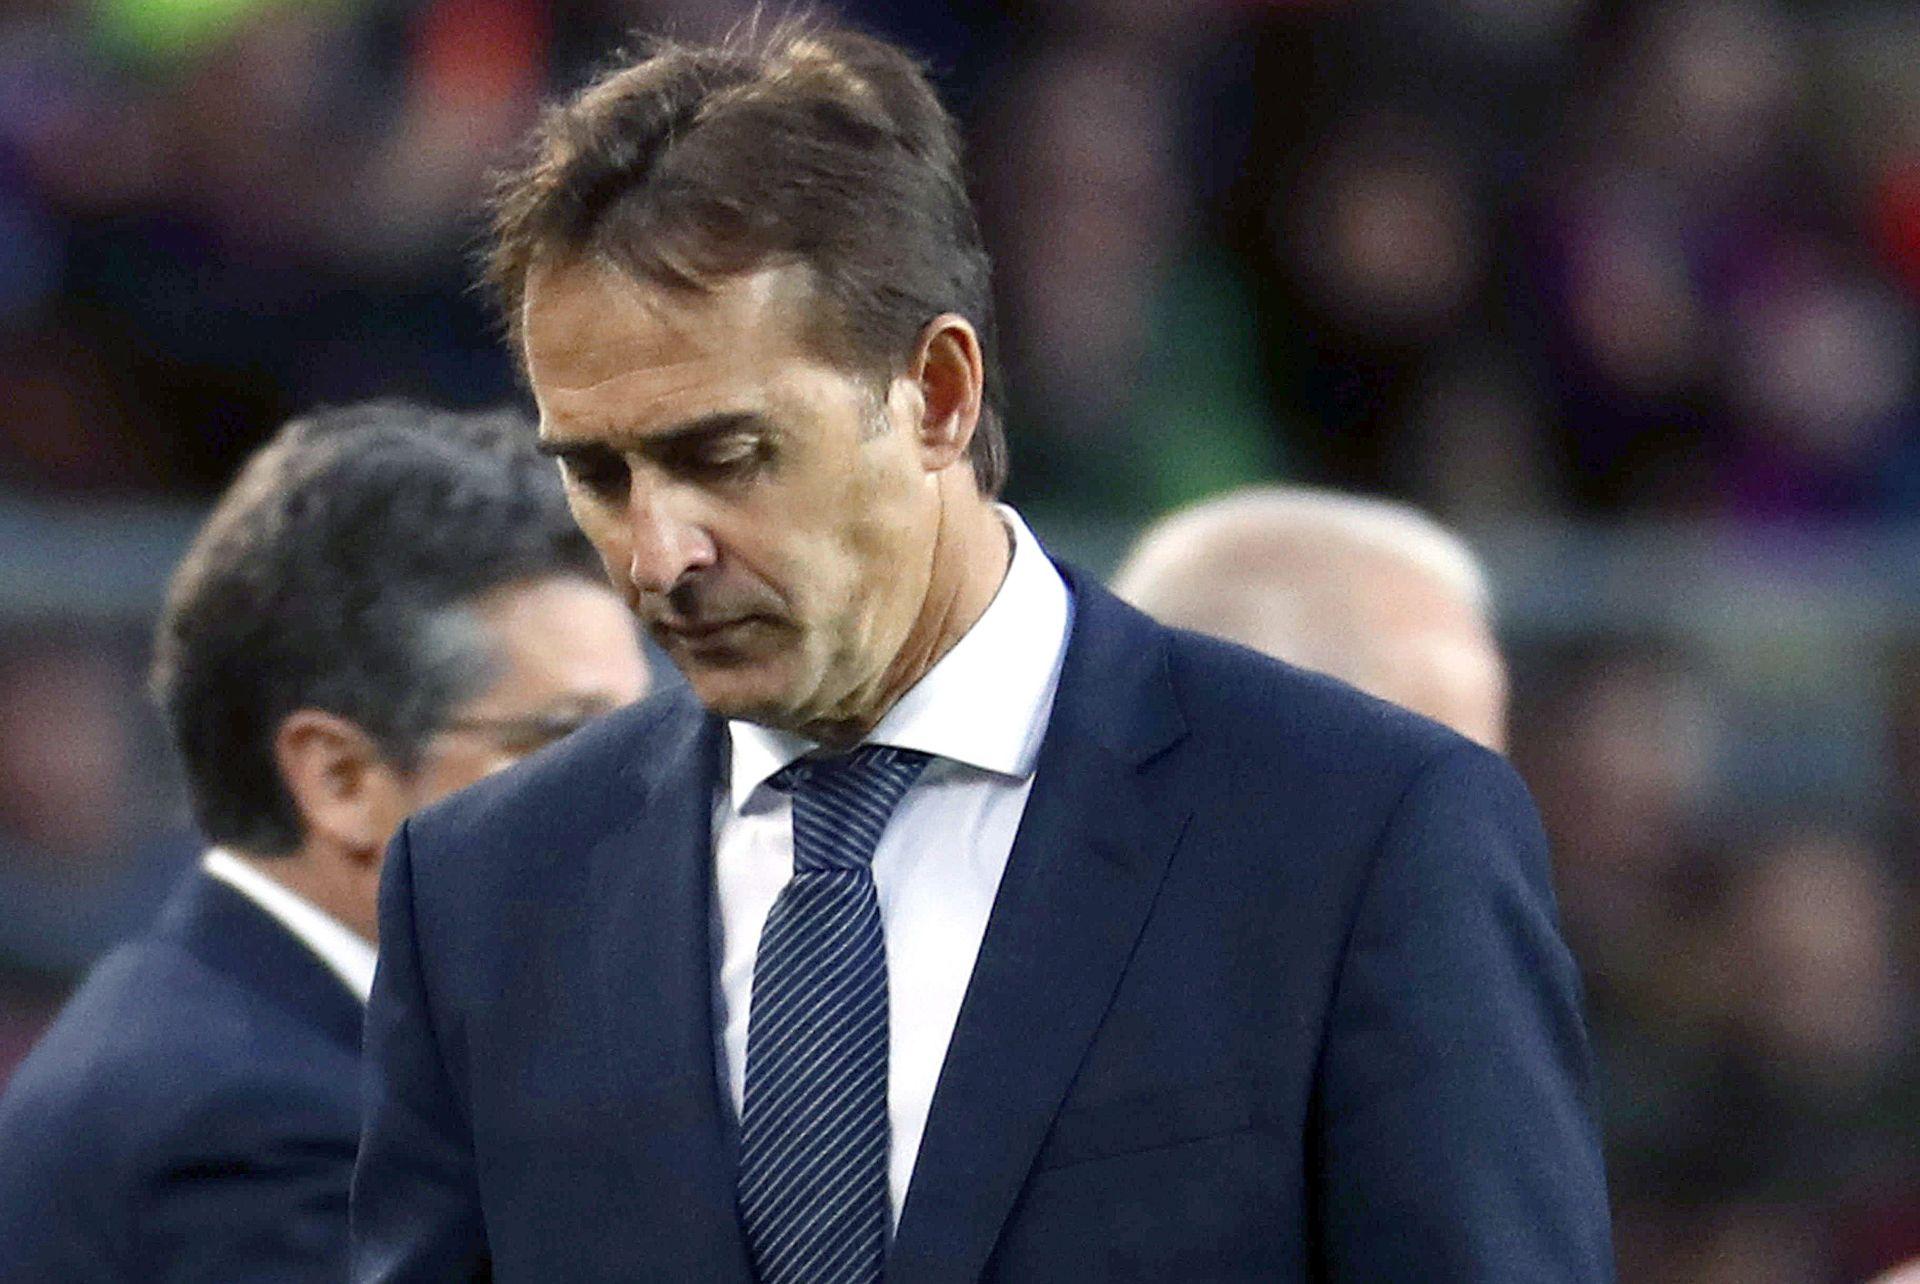 REAL MADRID Lopeteguiju otkaz, Solari privremeni trener 'Kraljeva'